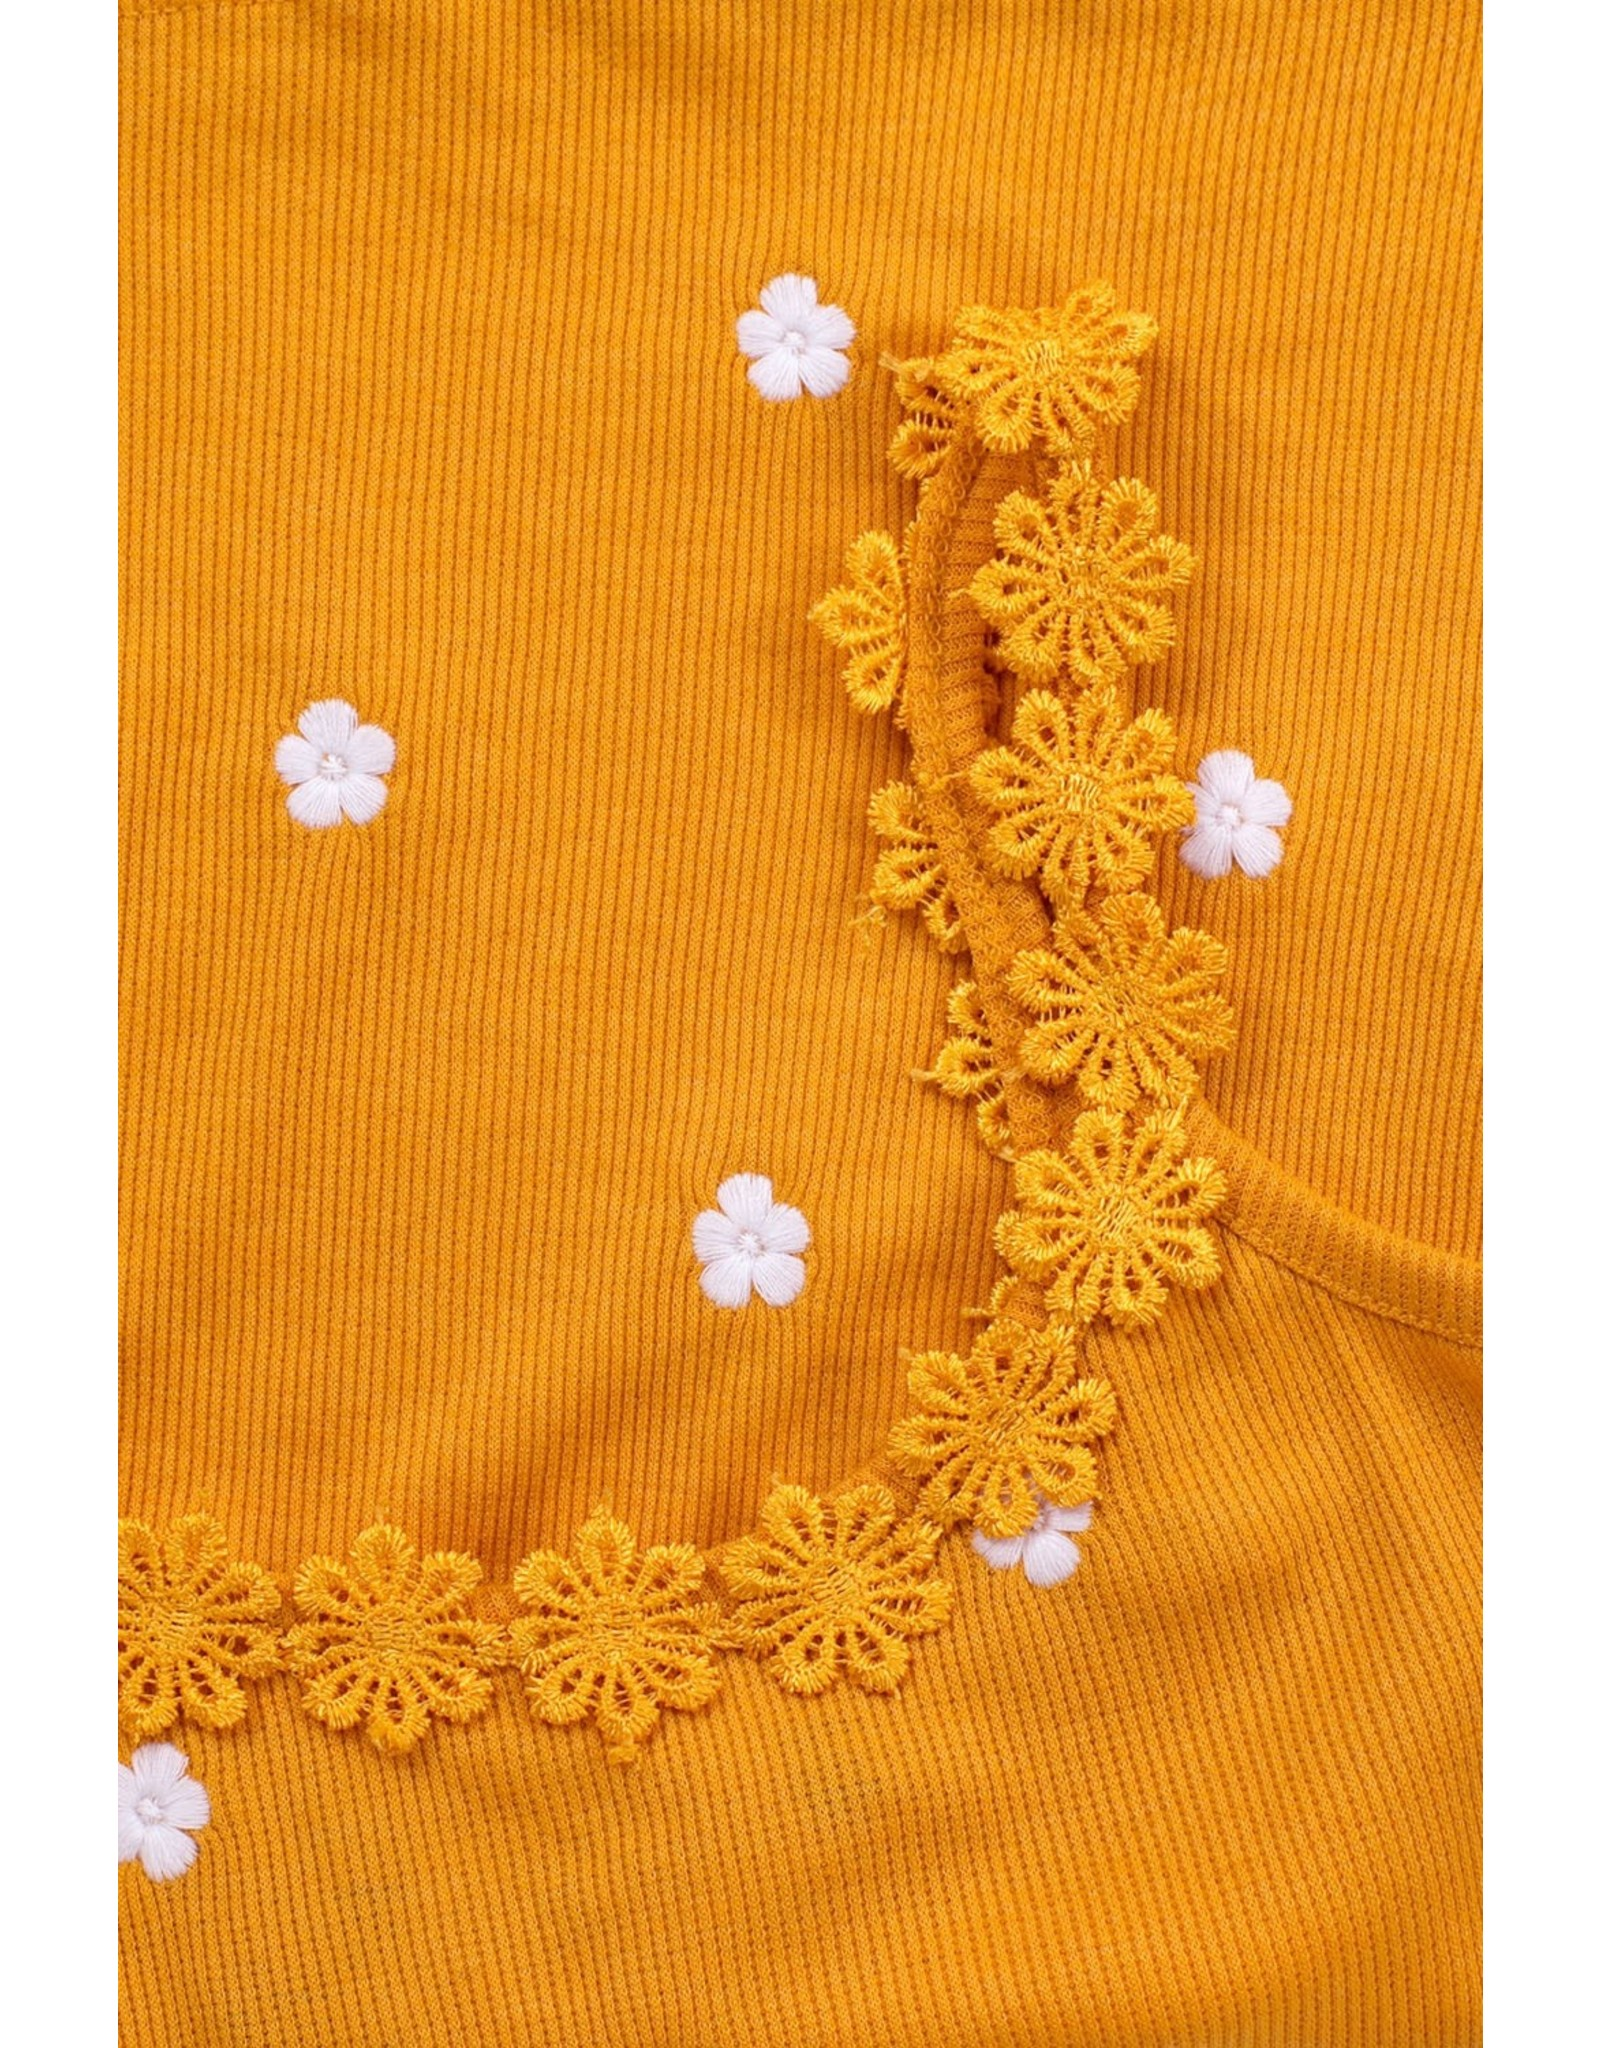 Looxs 10SIXTEEN 10Sixteen rib singlet with daisy sunflower